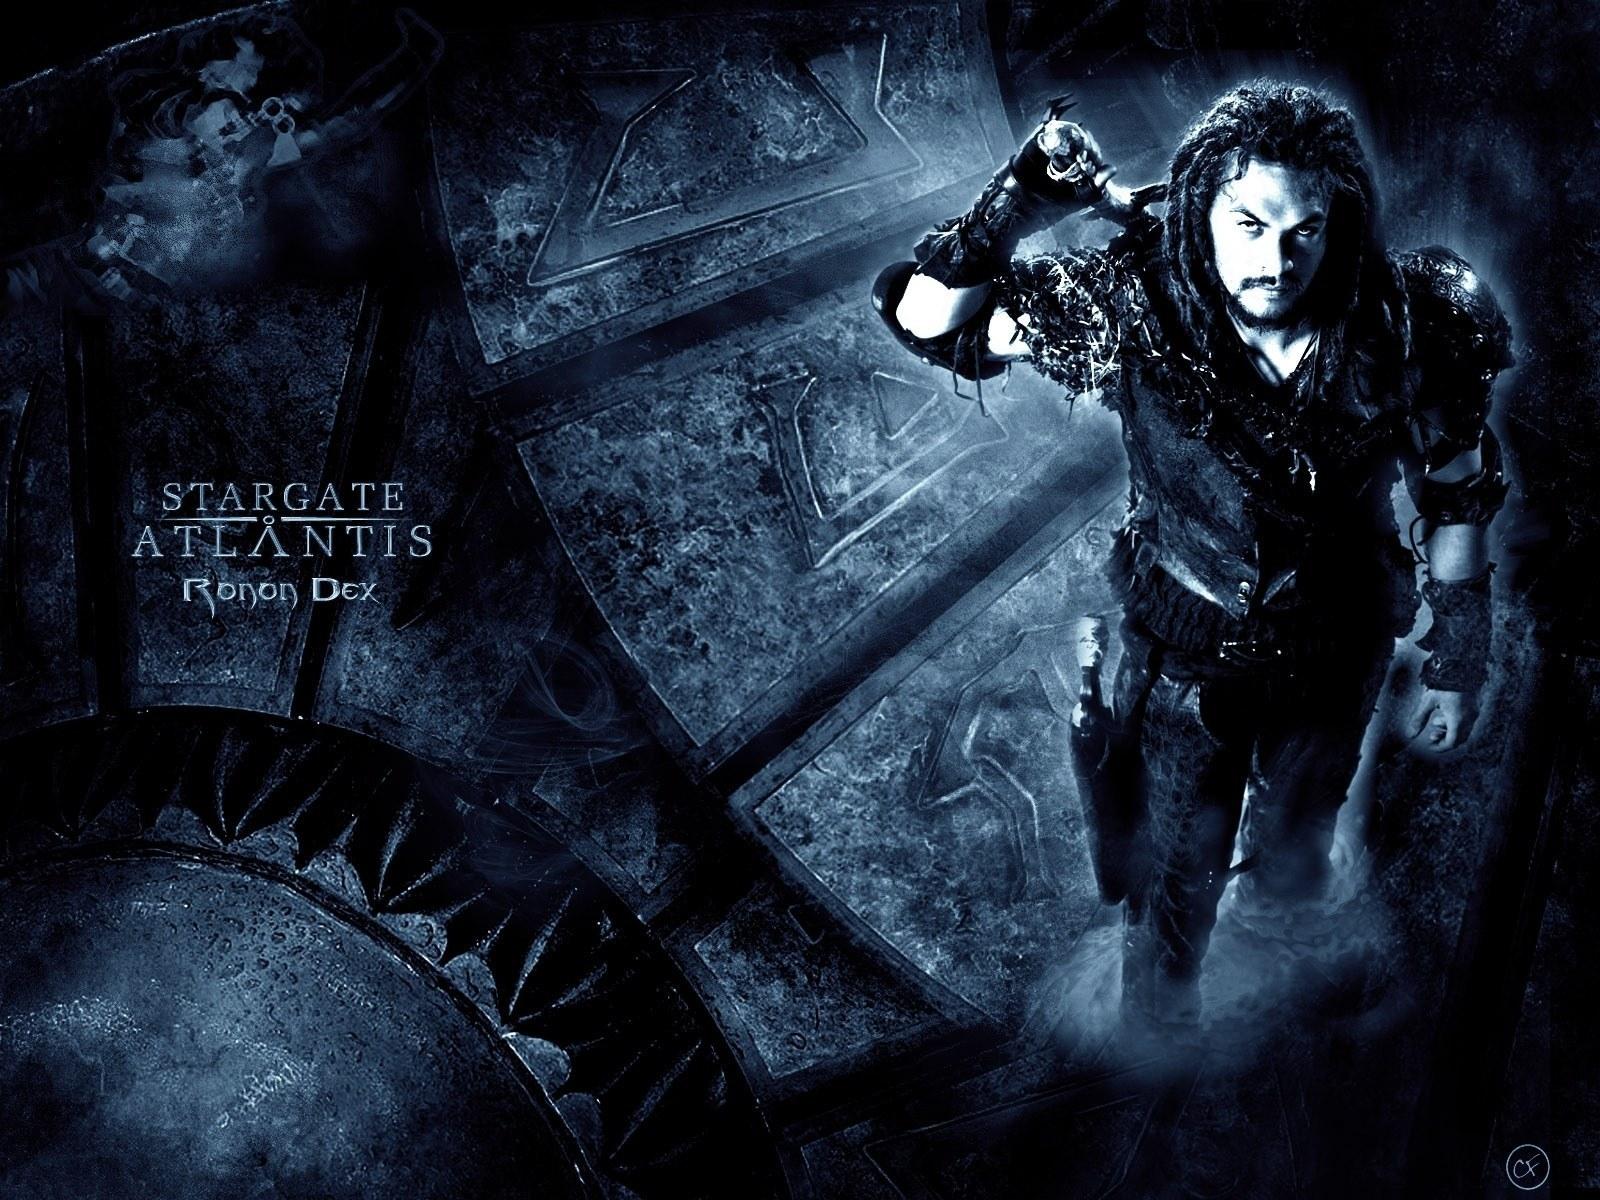 Stargate atlantis wallpaper 1366x768 picture